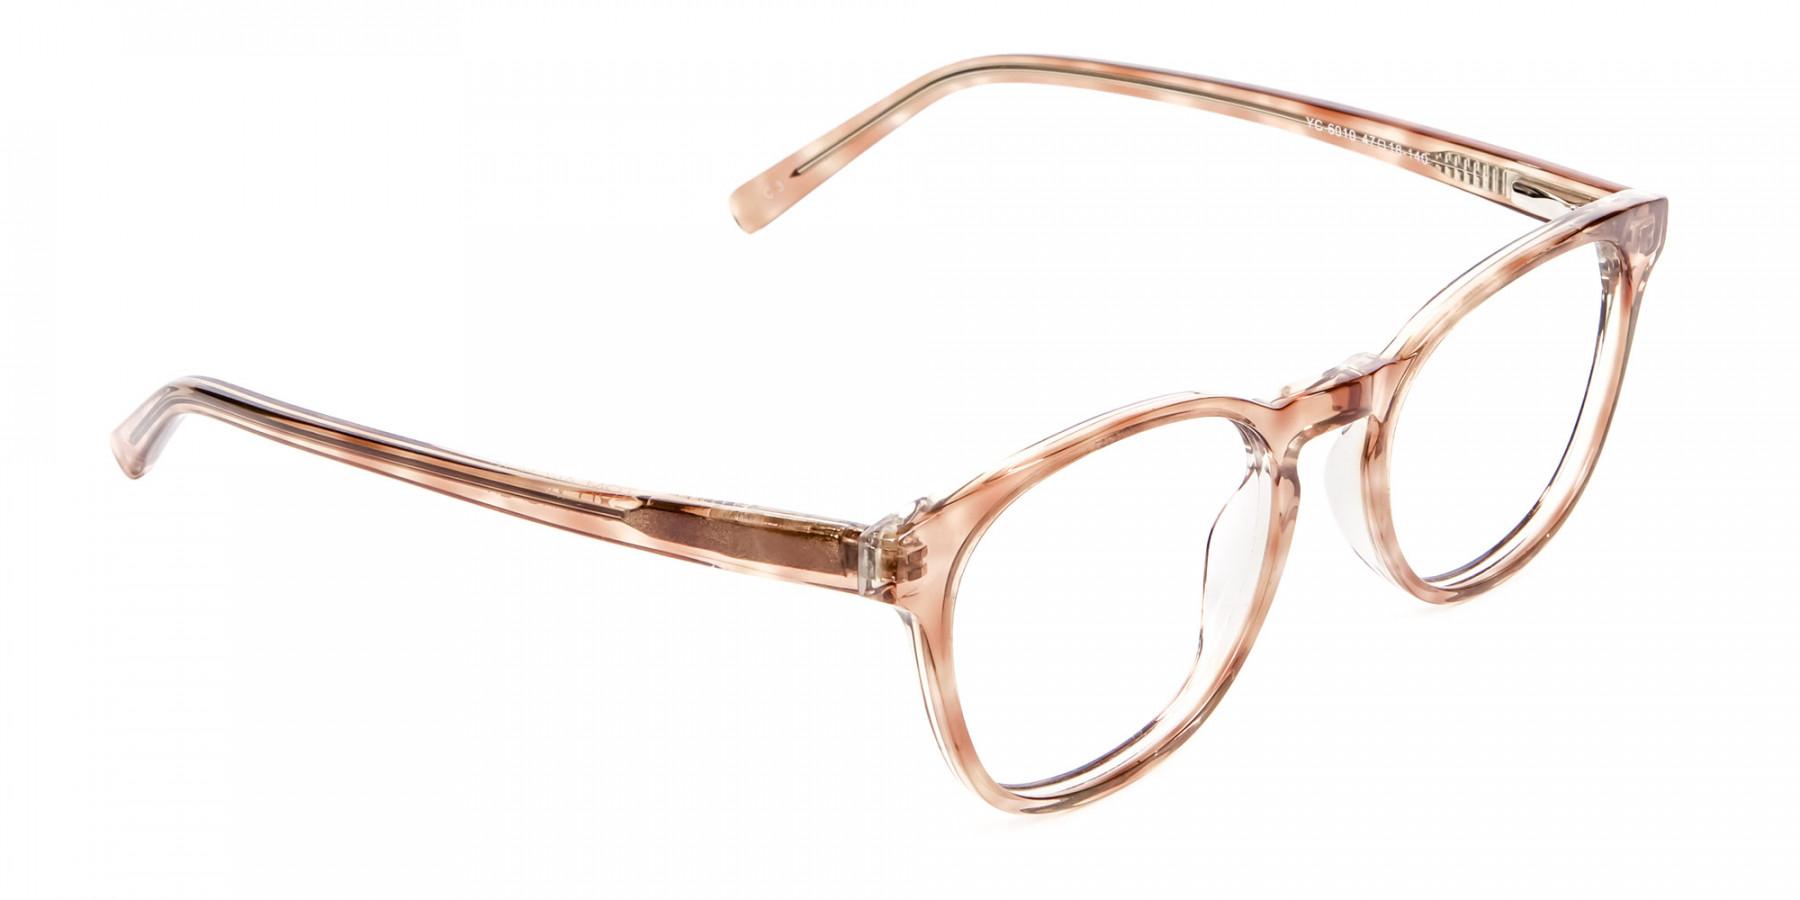 Havana Textured Designer Prescription Glasses - 1